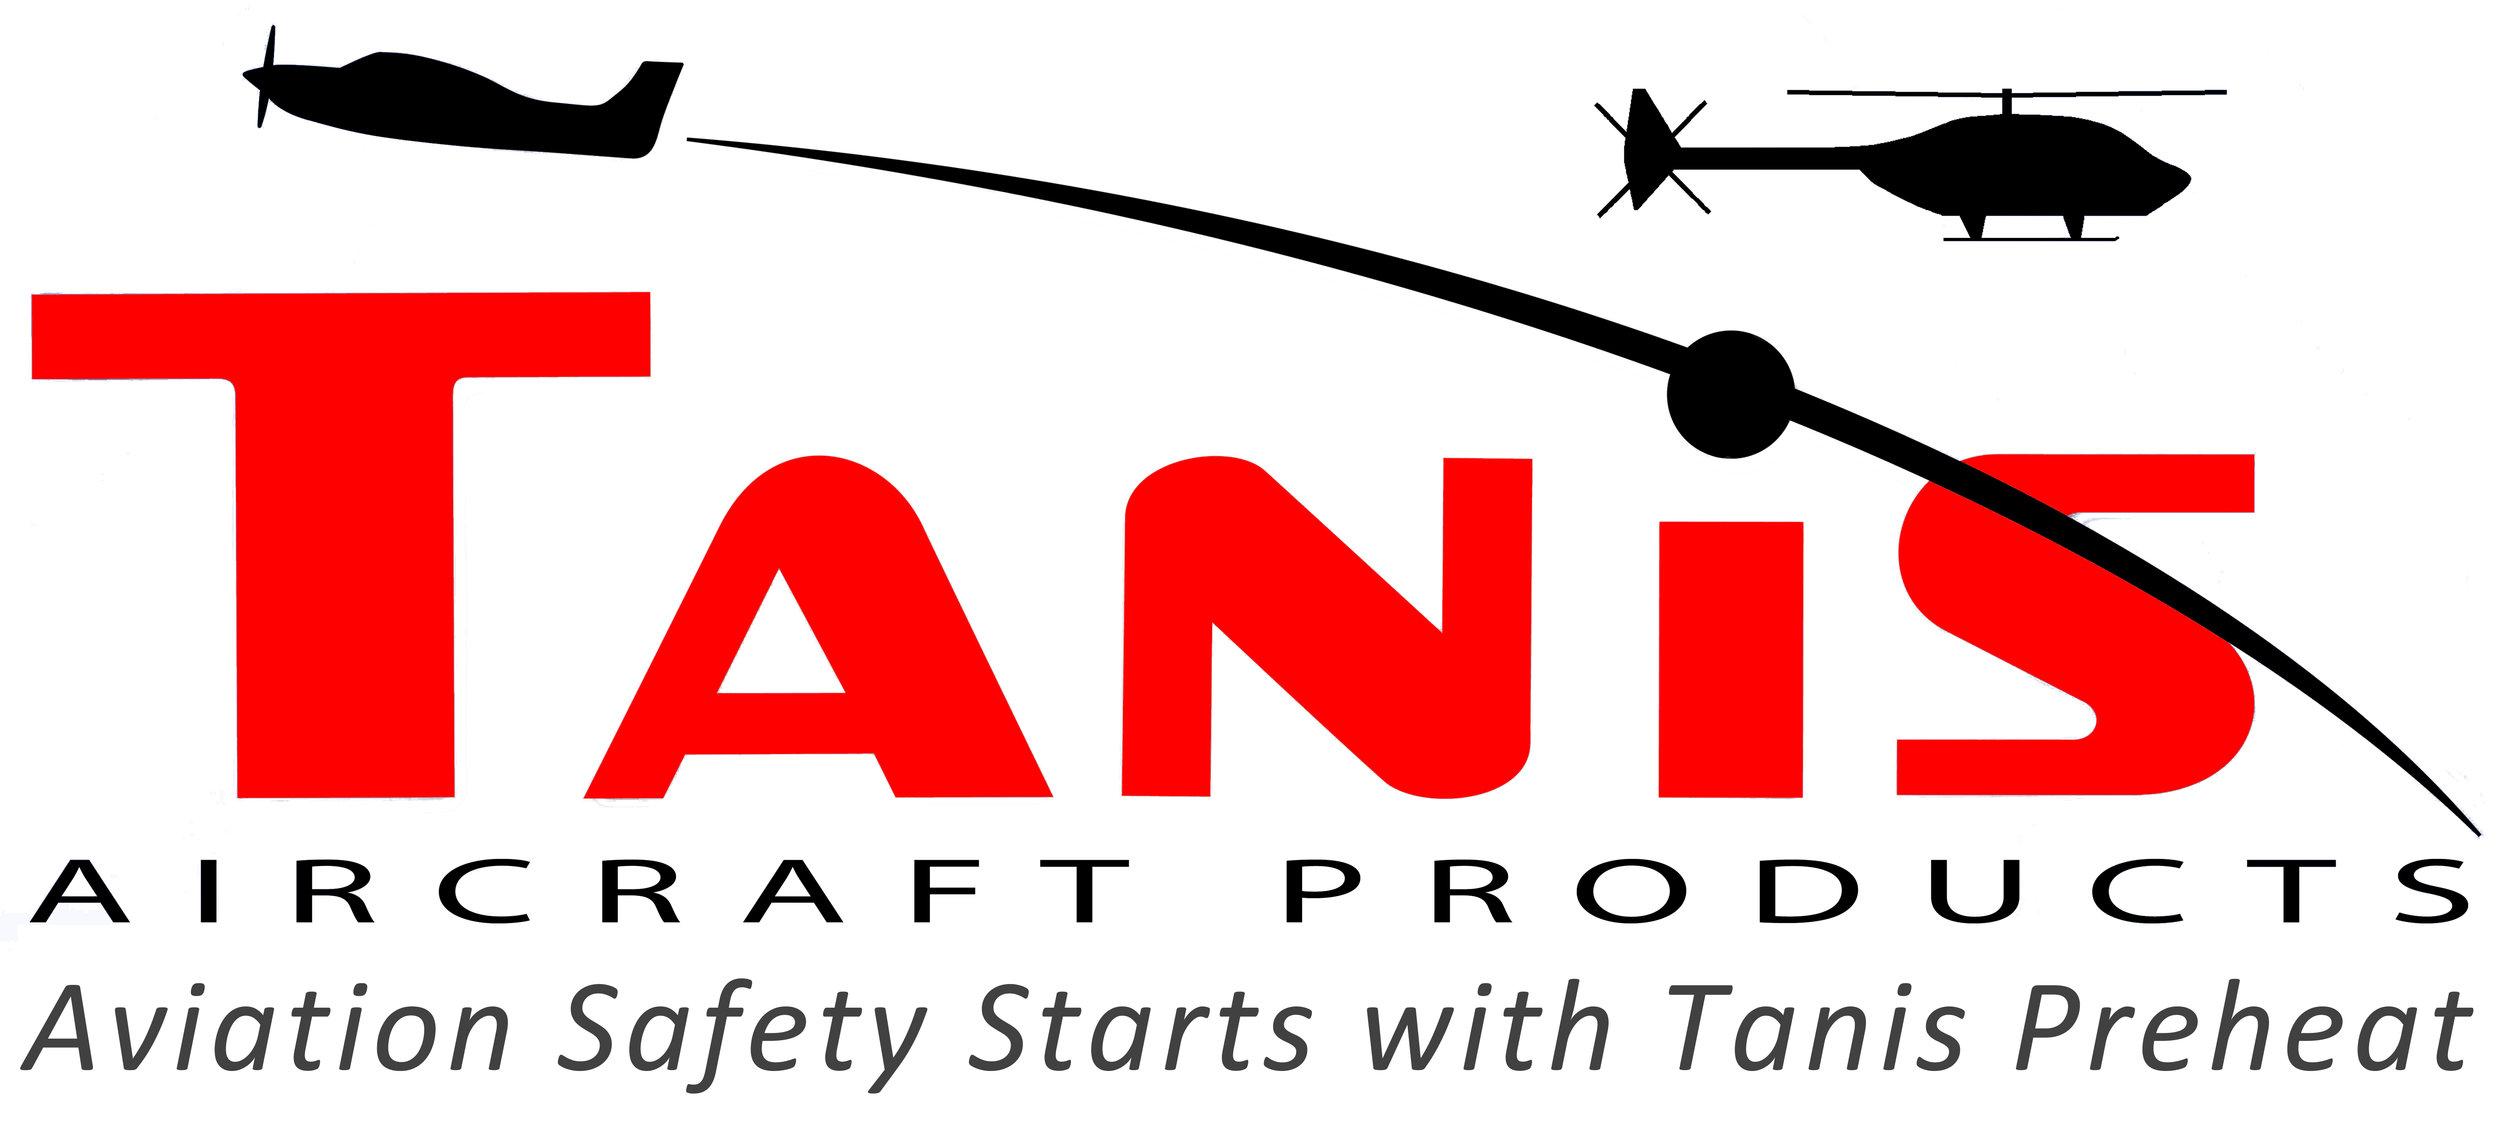 Tanis logo 2019.jpg